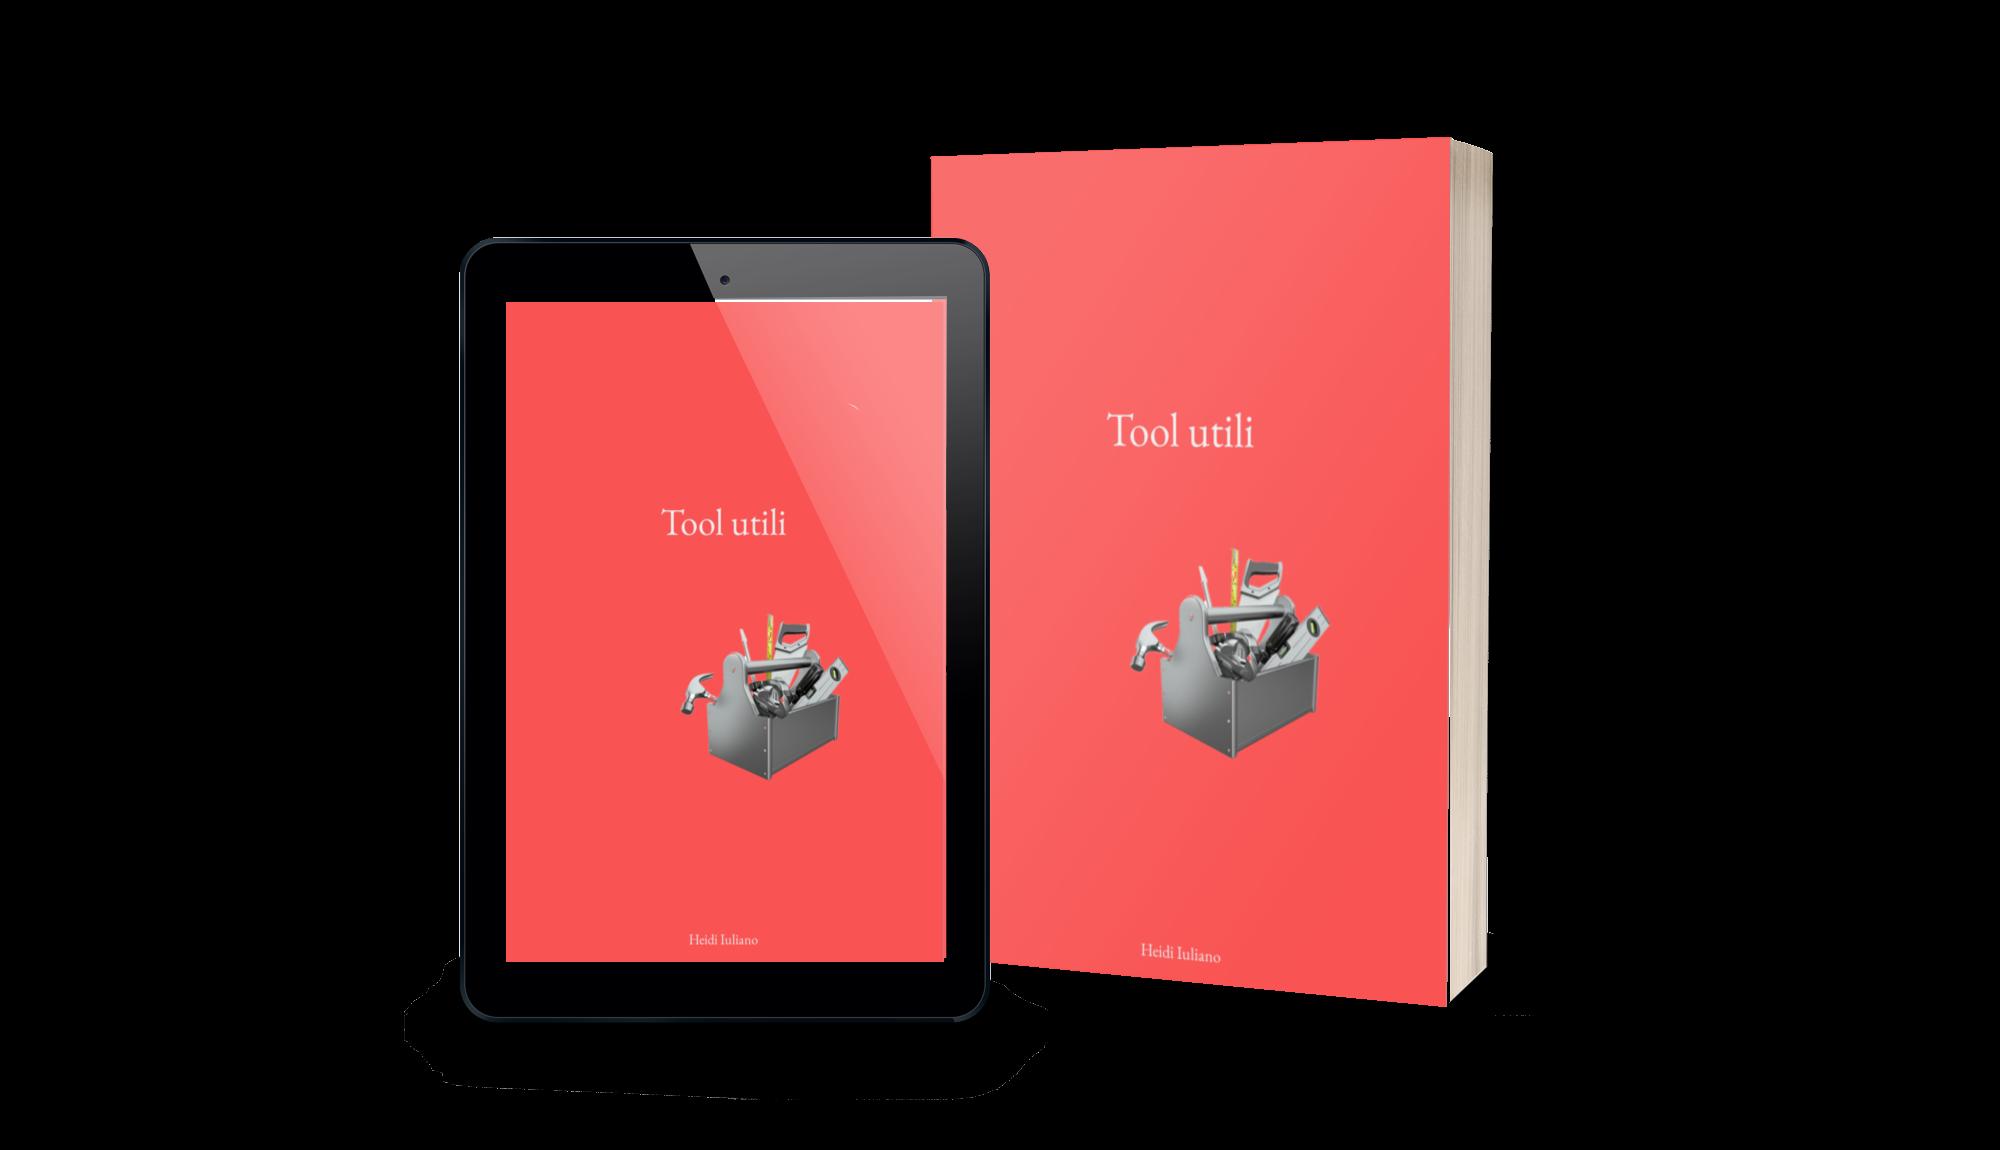 tool utili per il digitale